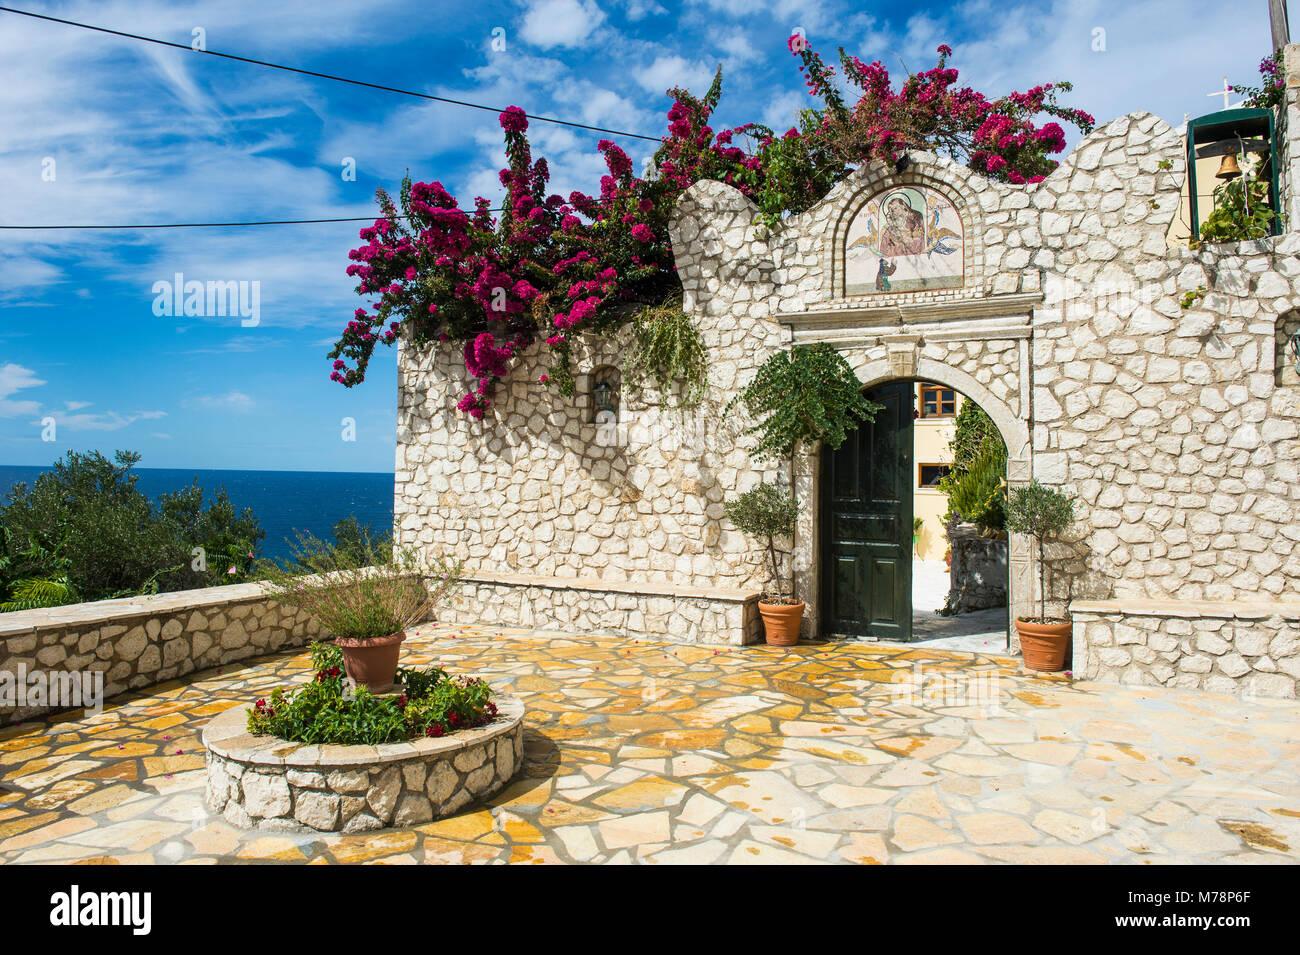 Monastery of Panagia Mirtiotissa, Corfu, Ionian islands, Greek Islands, Greece, Europe - Stock Image